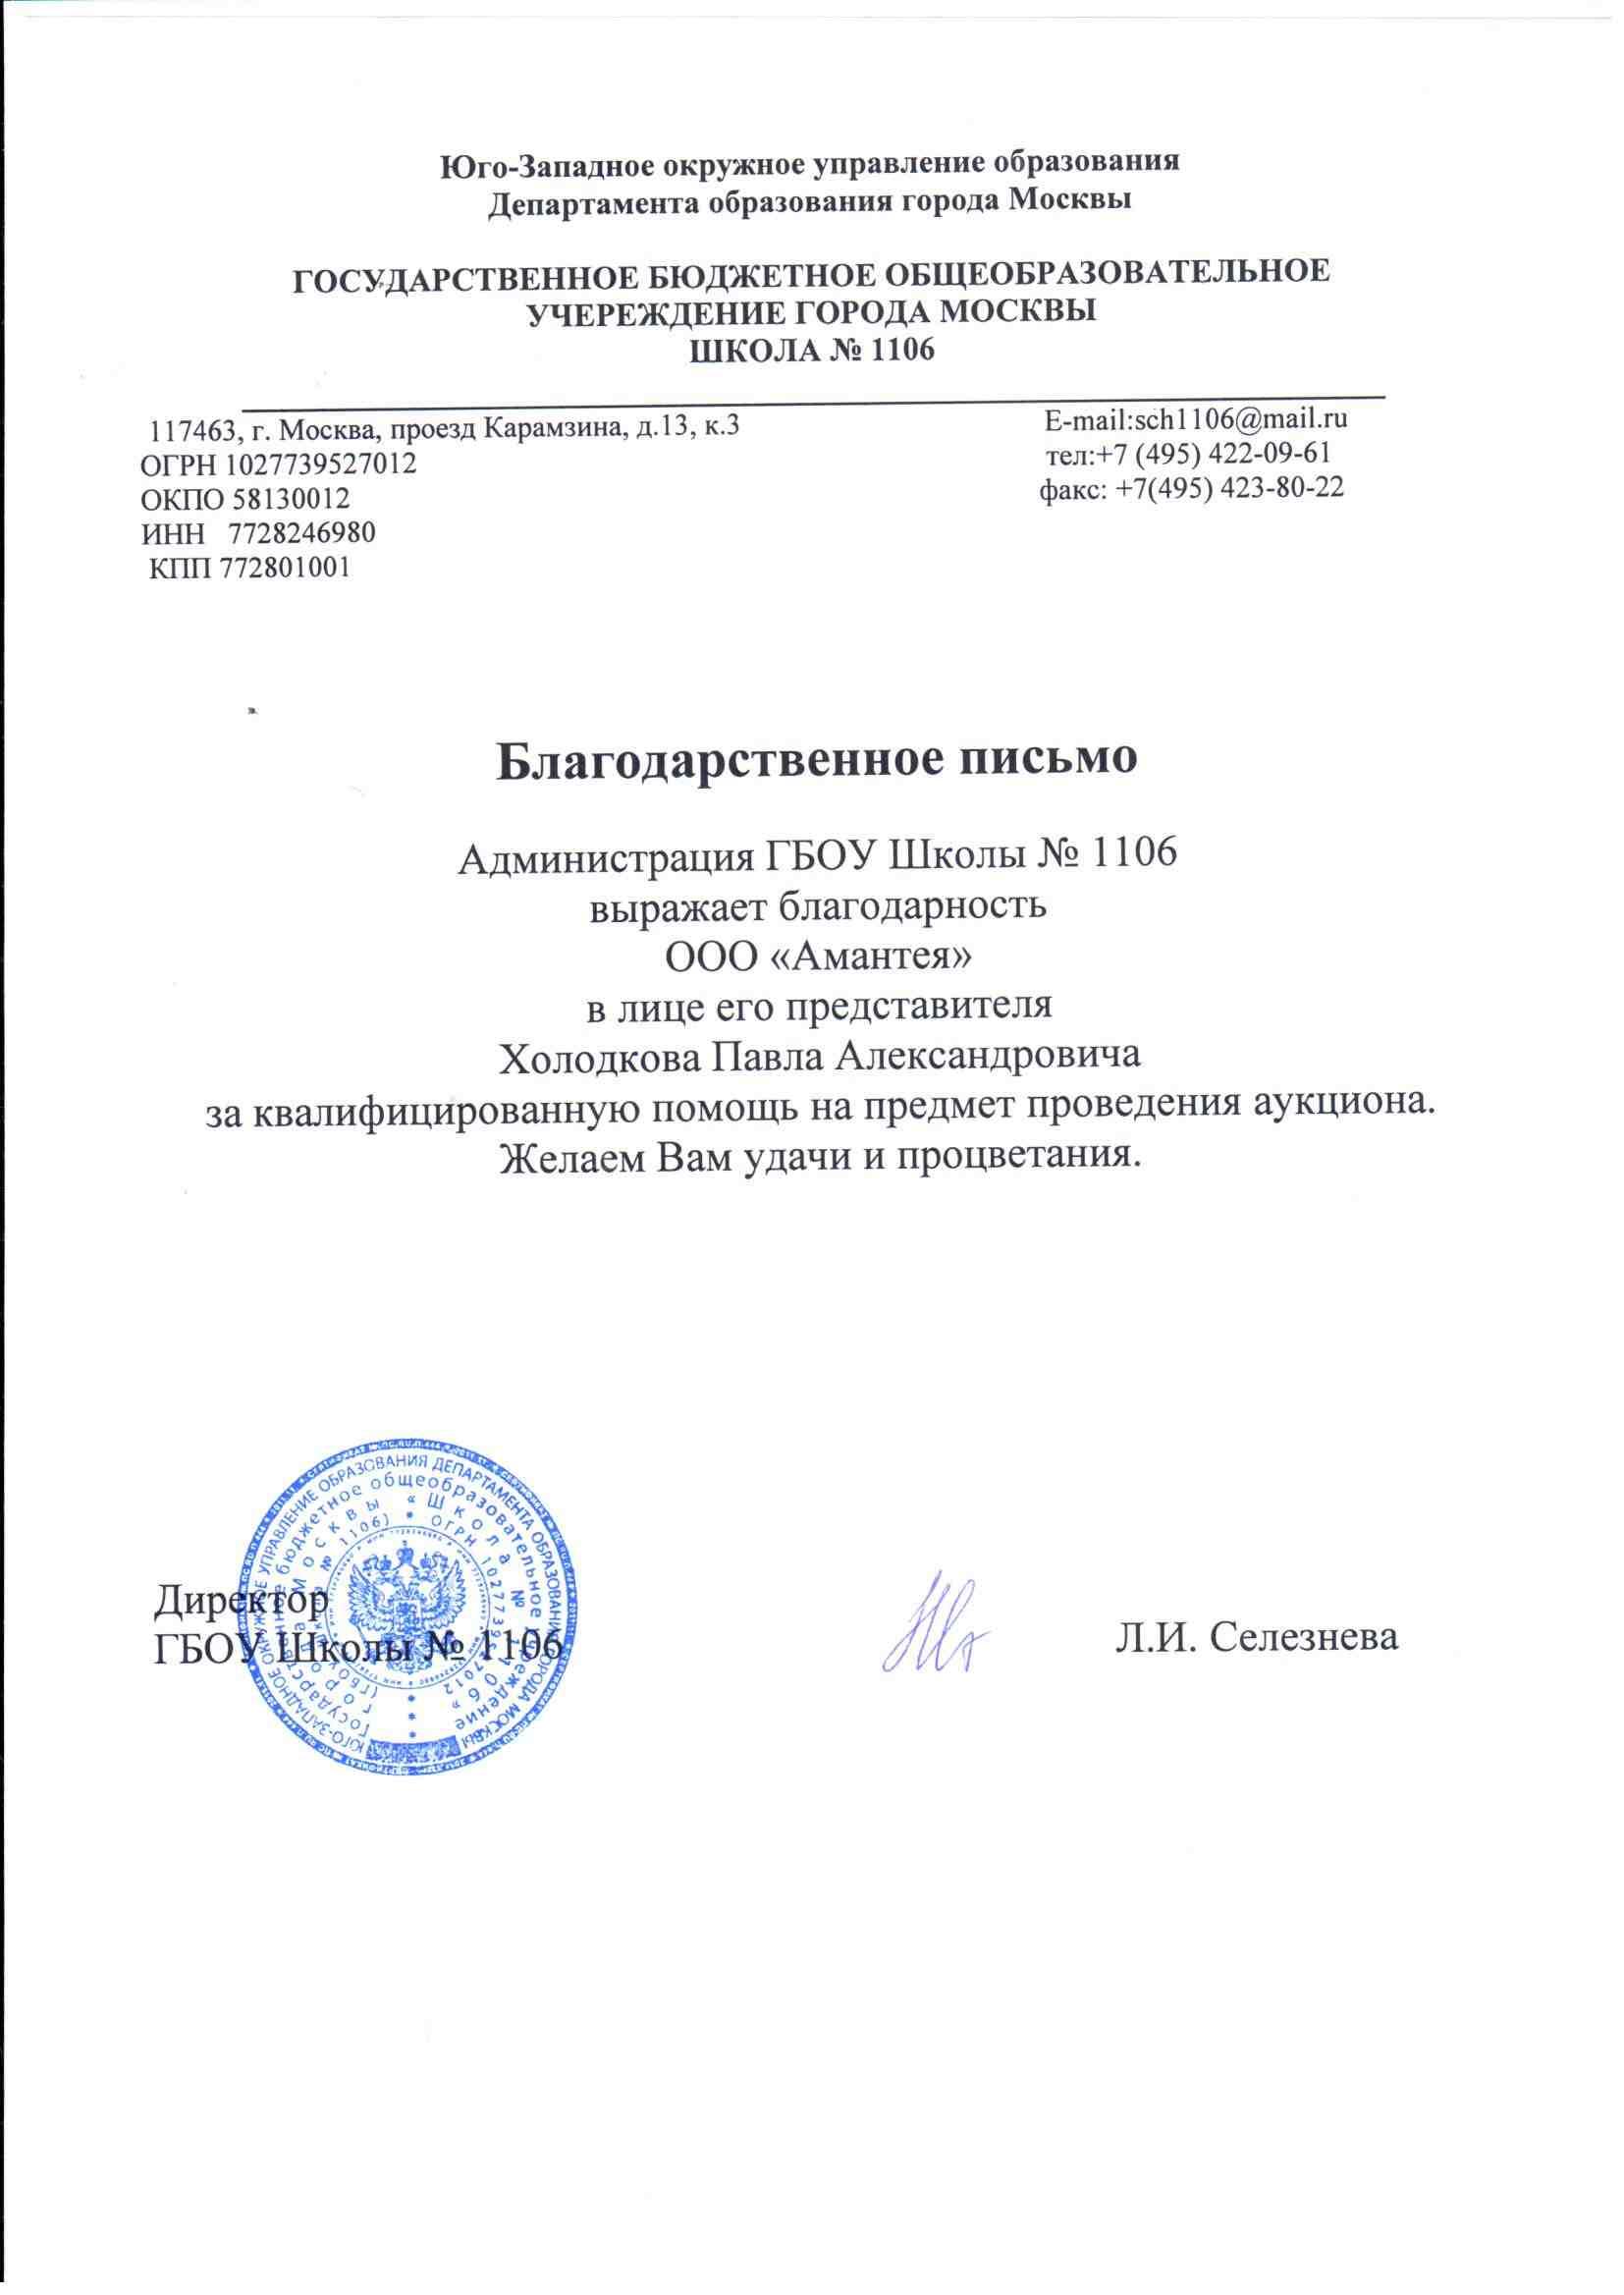 ГБОУ Школы №1106